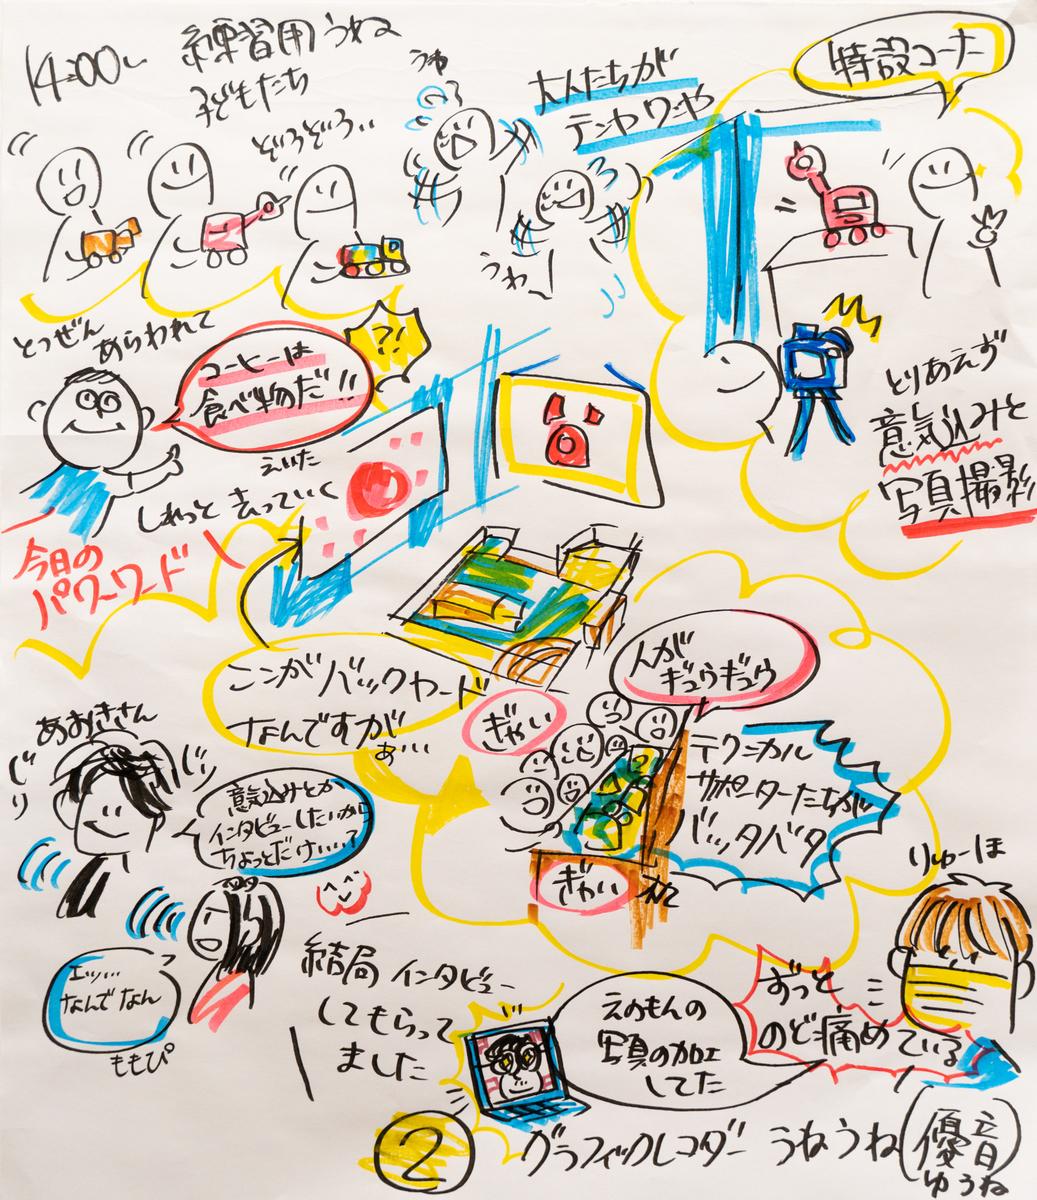 f:id:nakatsuka808:20190920155249j:plain